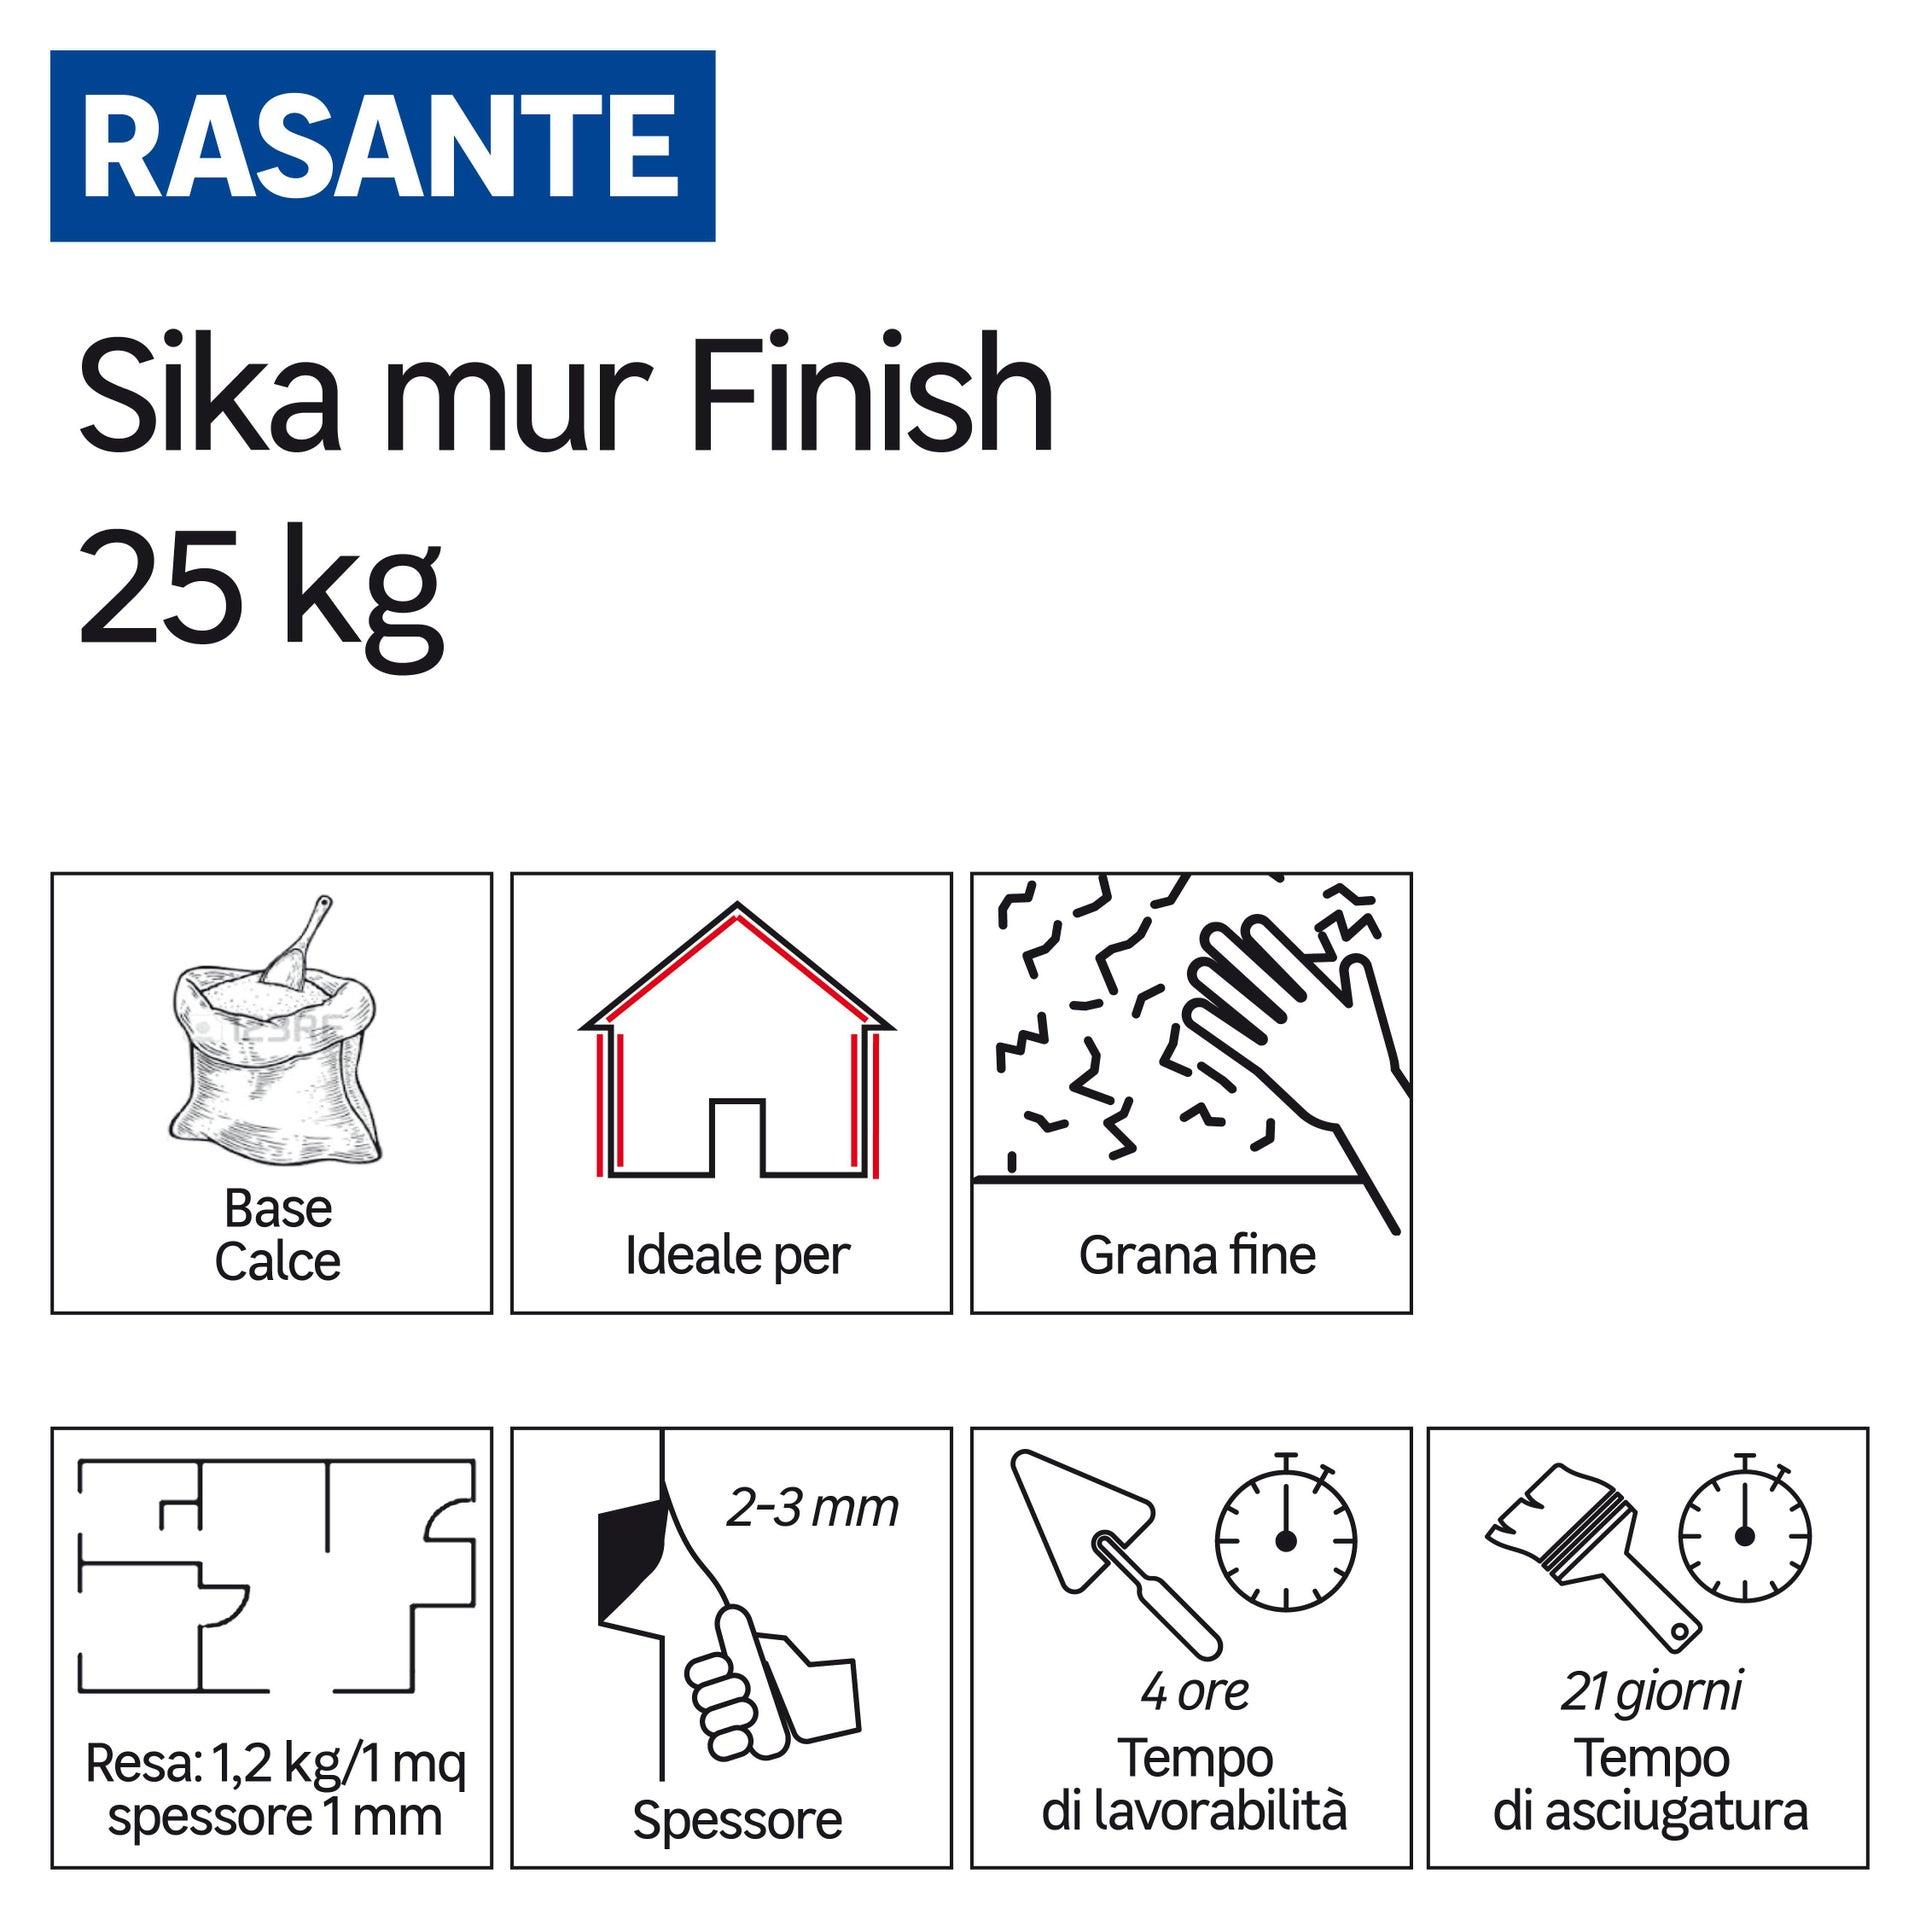 Rasatura SIKA Mur Finish 25 kg - 3